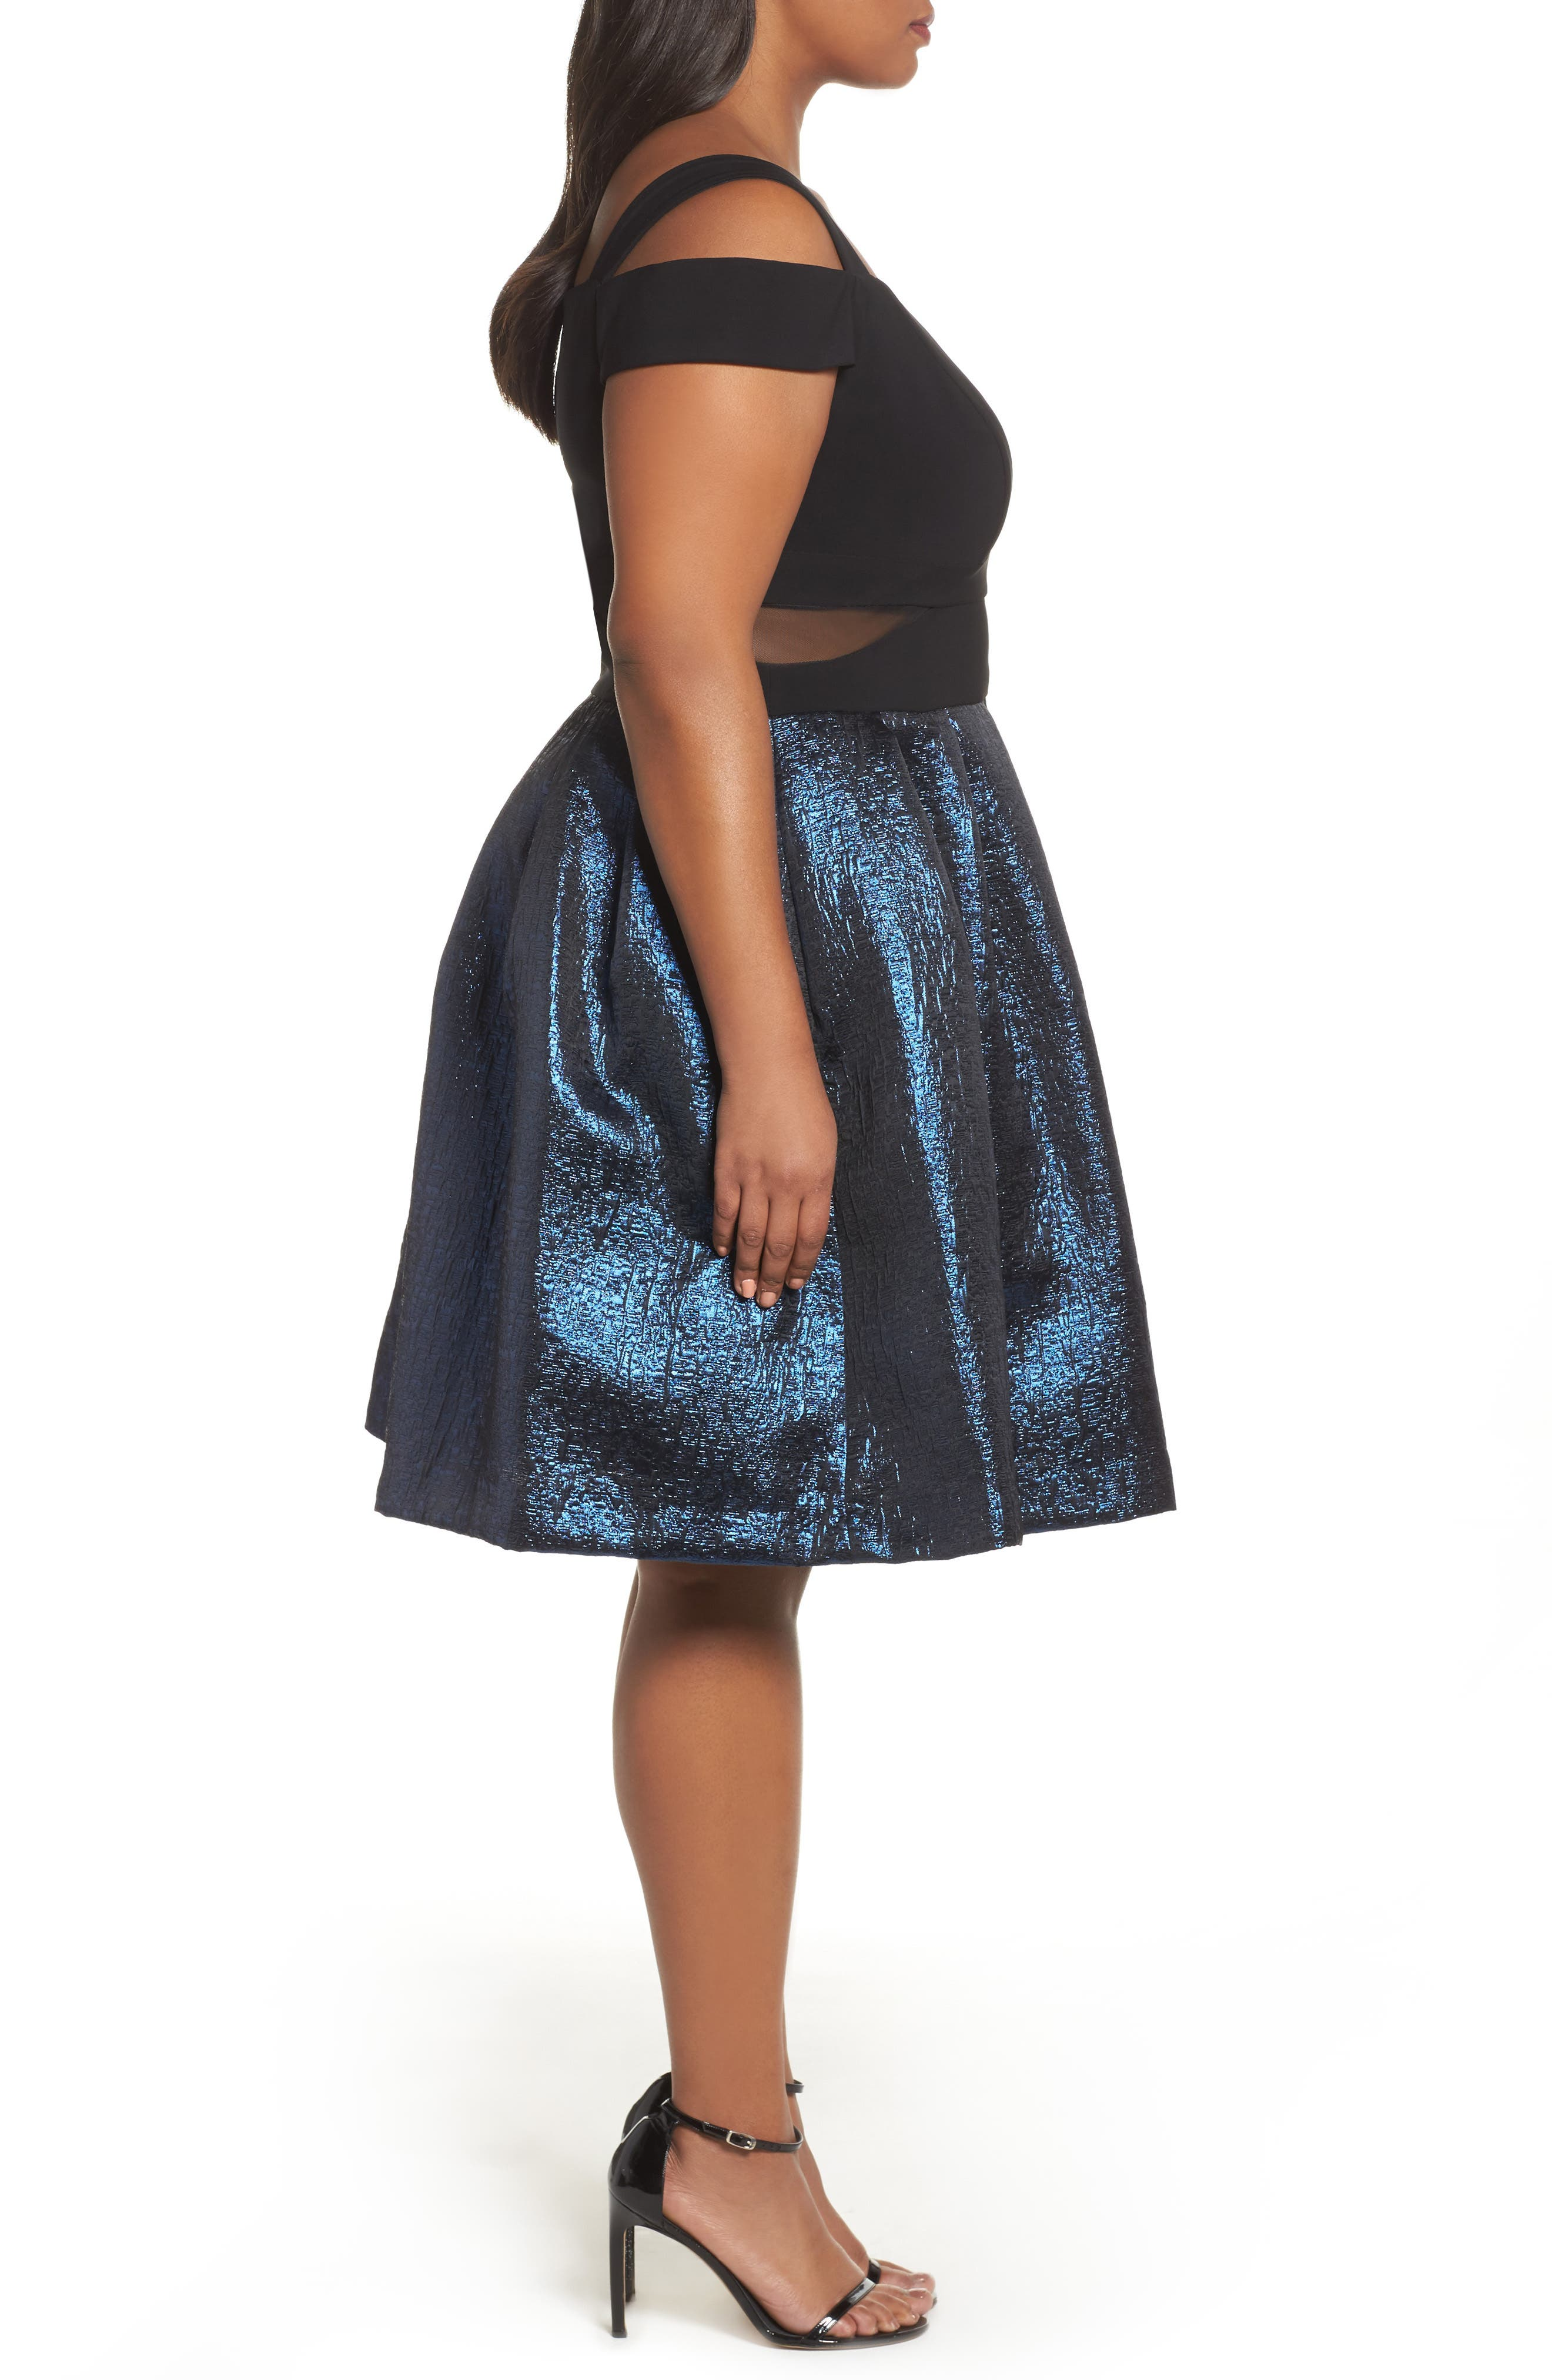 Cold Shoulder Mixed Media Party Dress,                             Alternate thumbnail 3, color,                             Black/ Blue